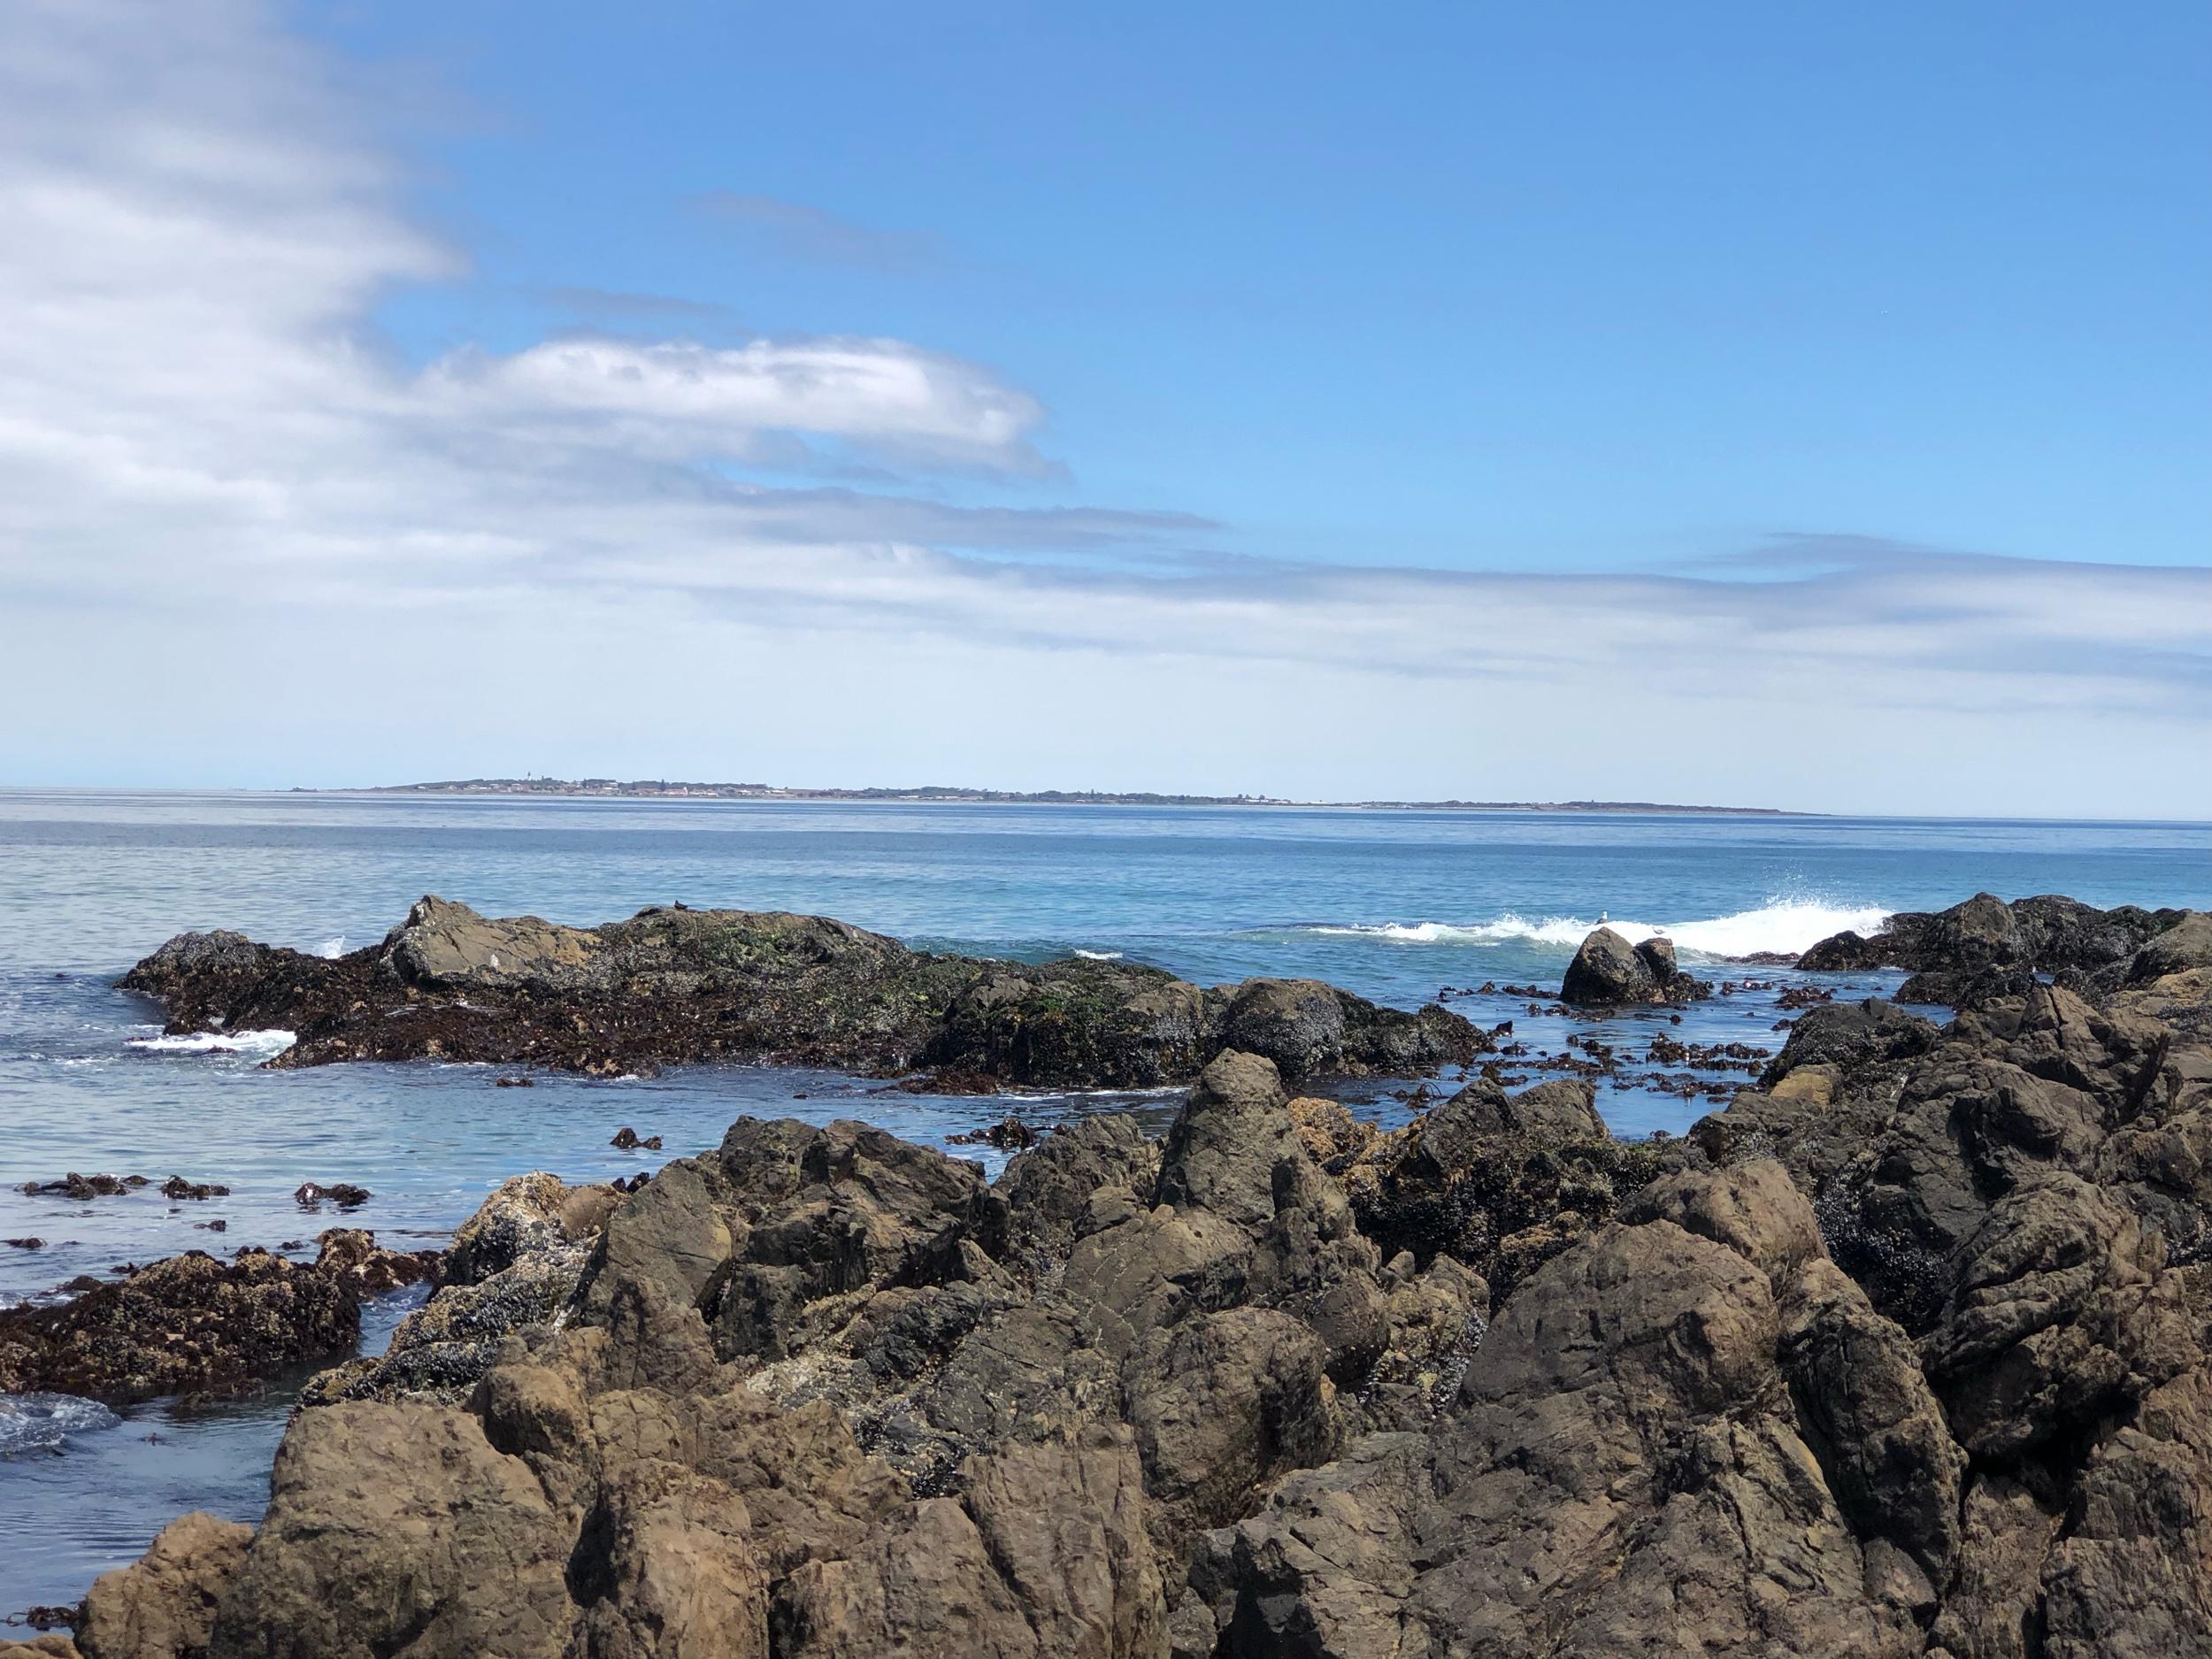 Cape Town Robben Island Ocean View